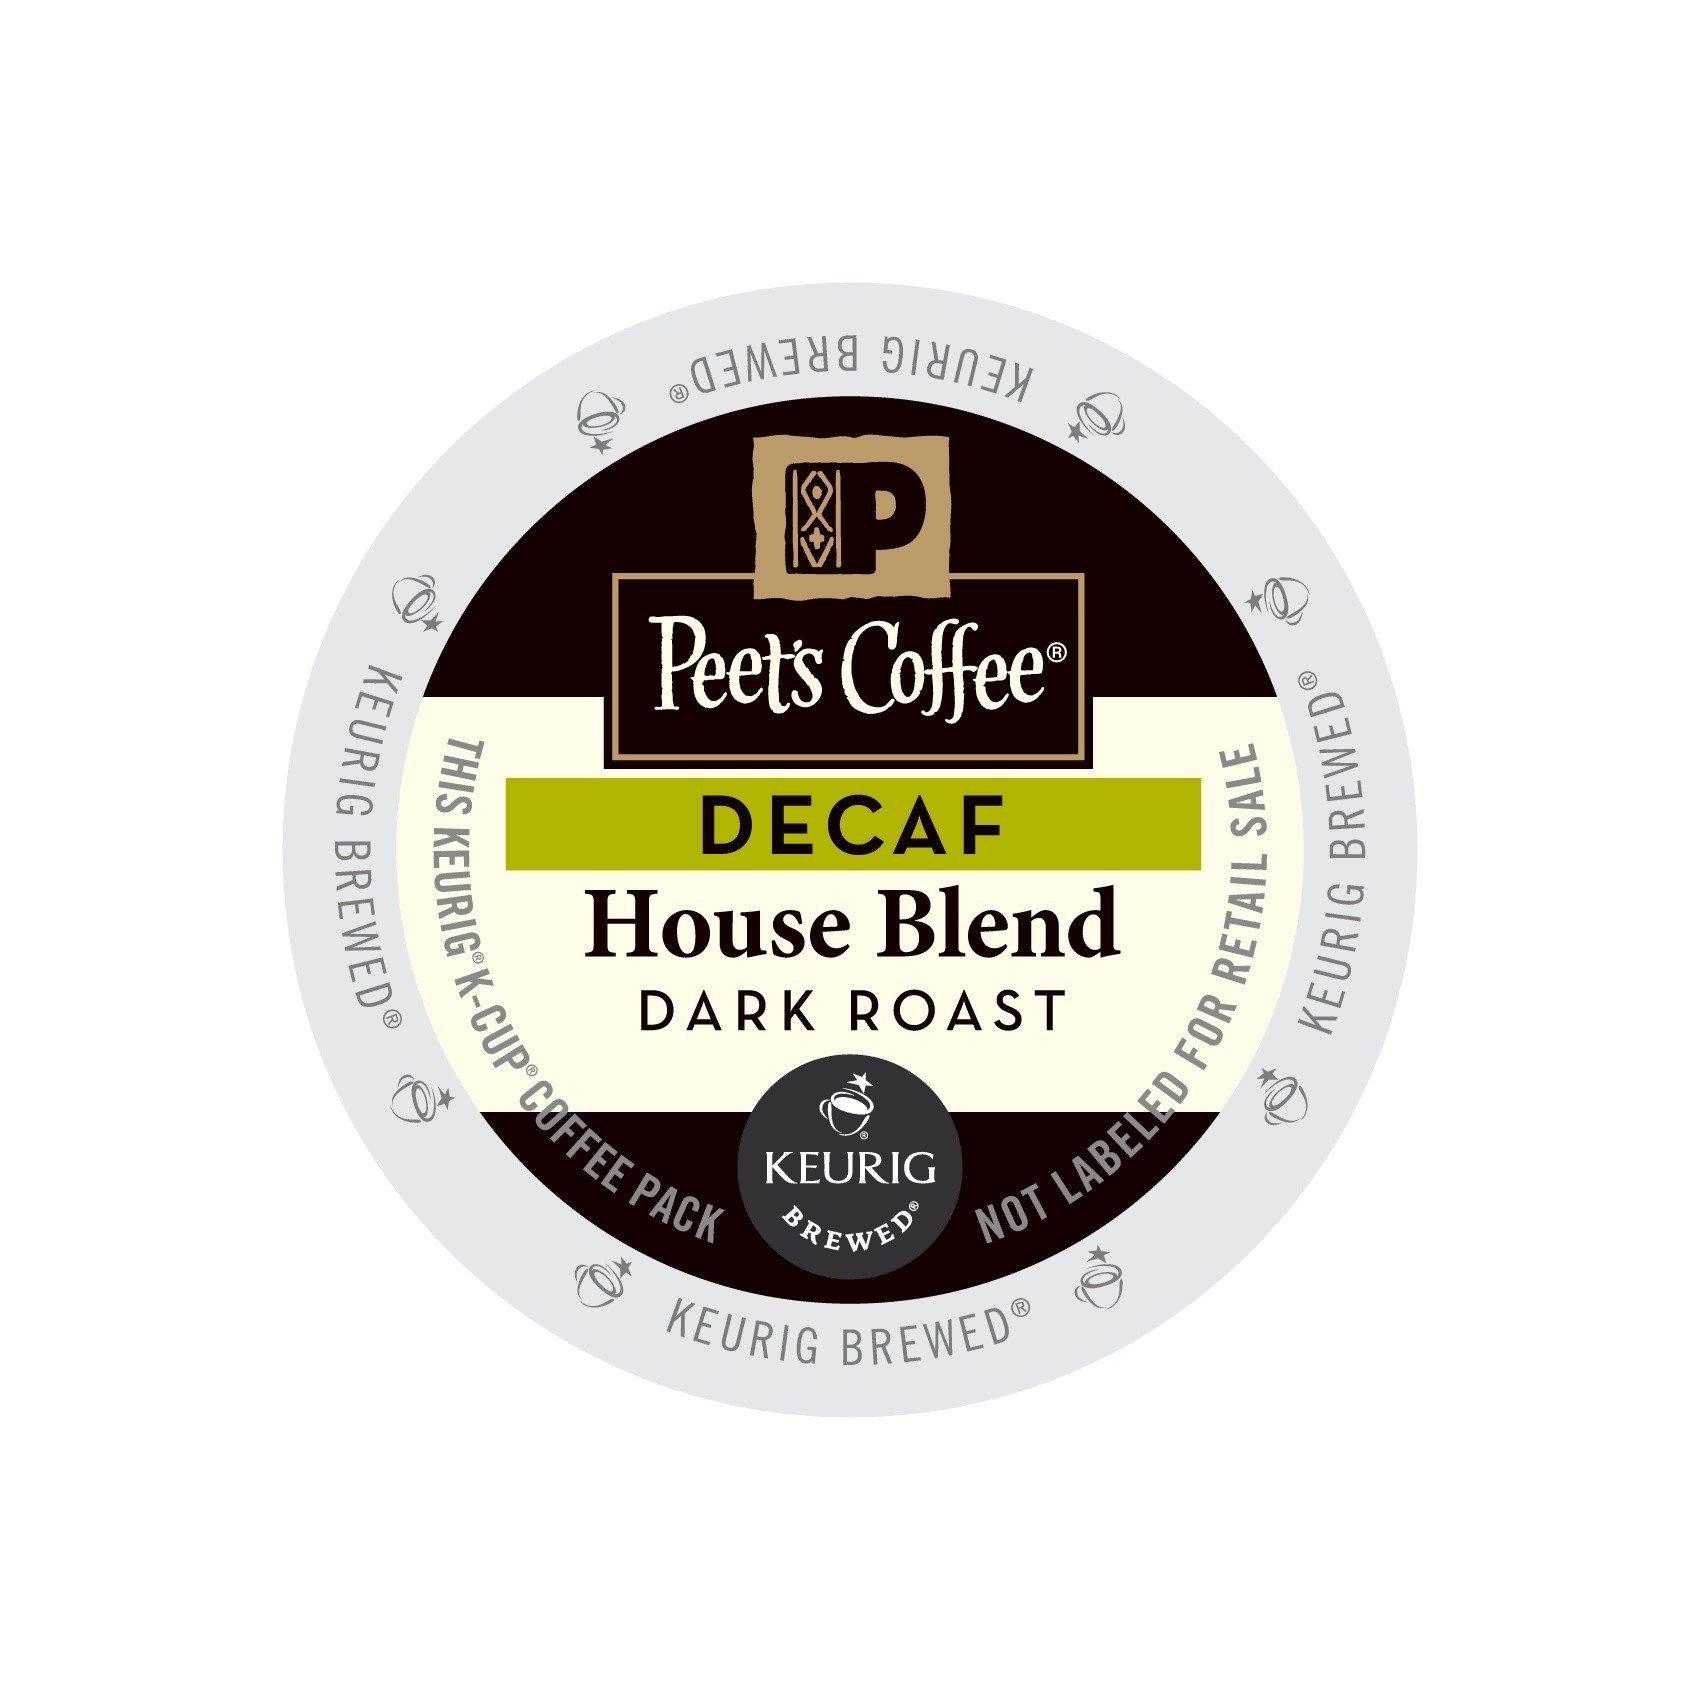 Peet's Coffee & Tea Decaf House Blend K-Cup Portion Pack for Keurig K-Cup Brewers, 22 Count